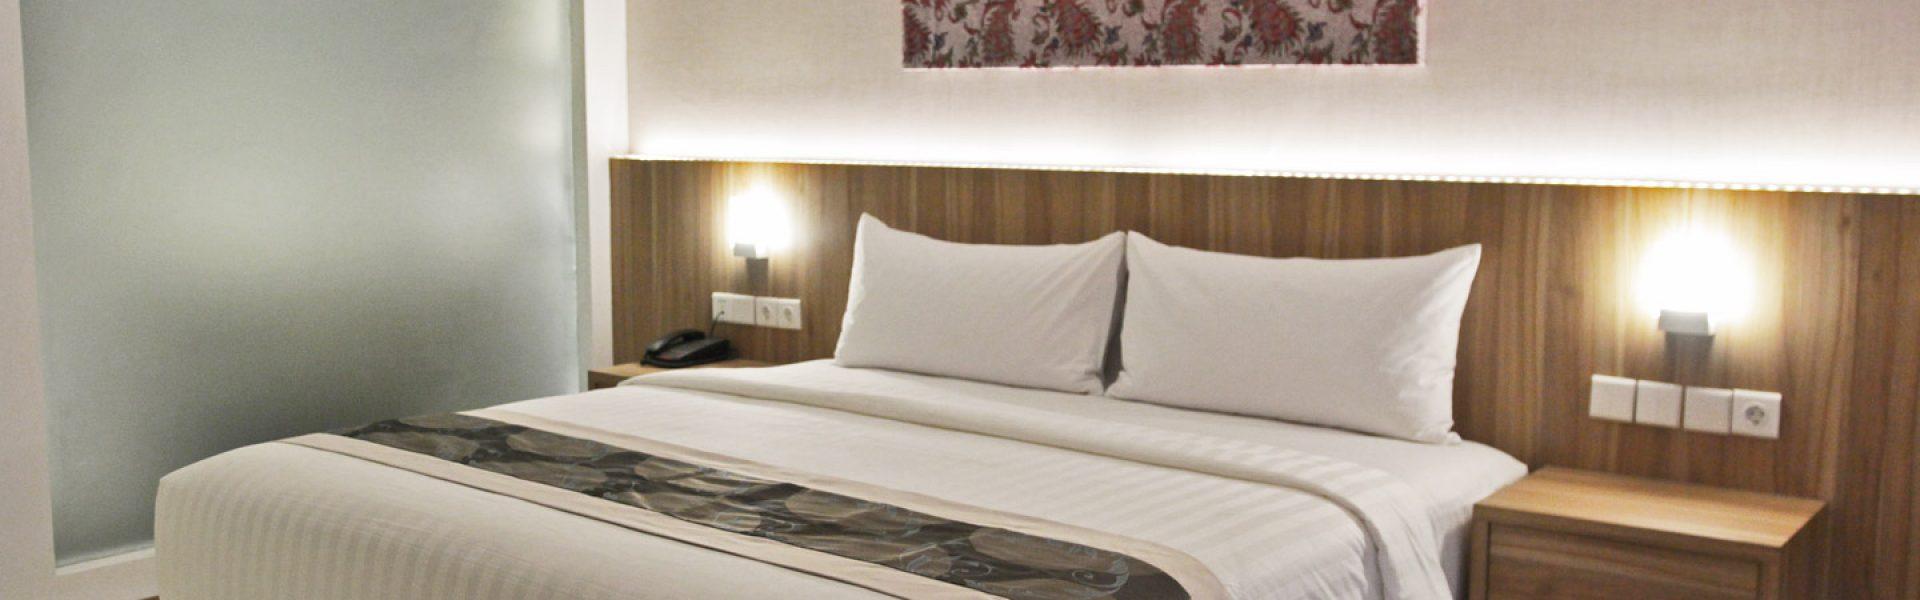 Capital Hotel Bali Deluxe Room 1